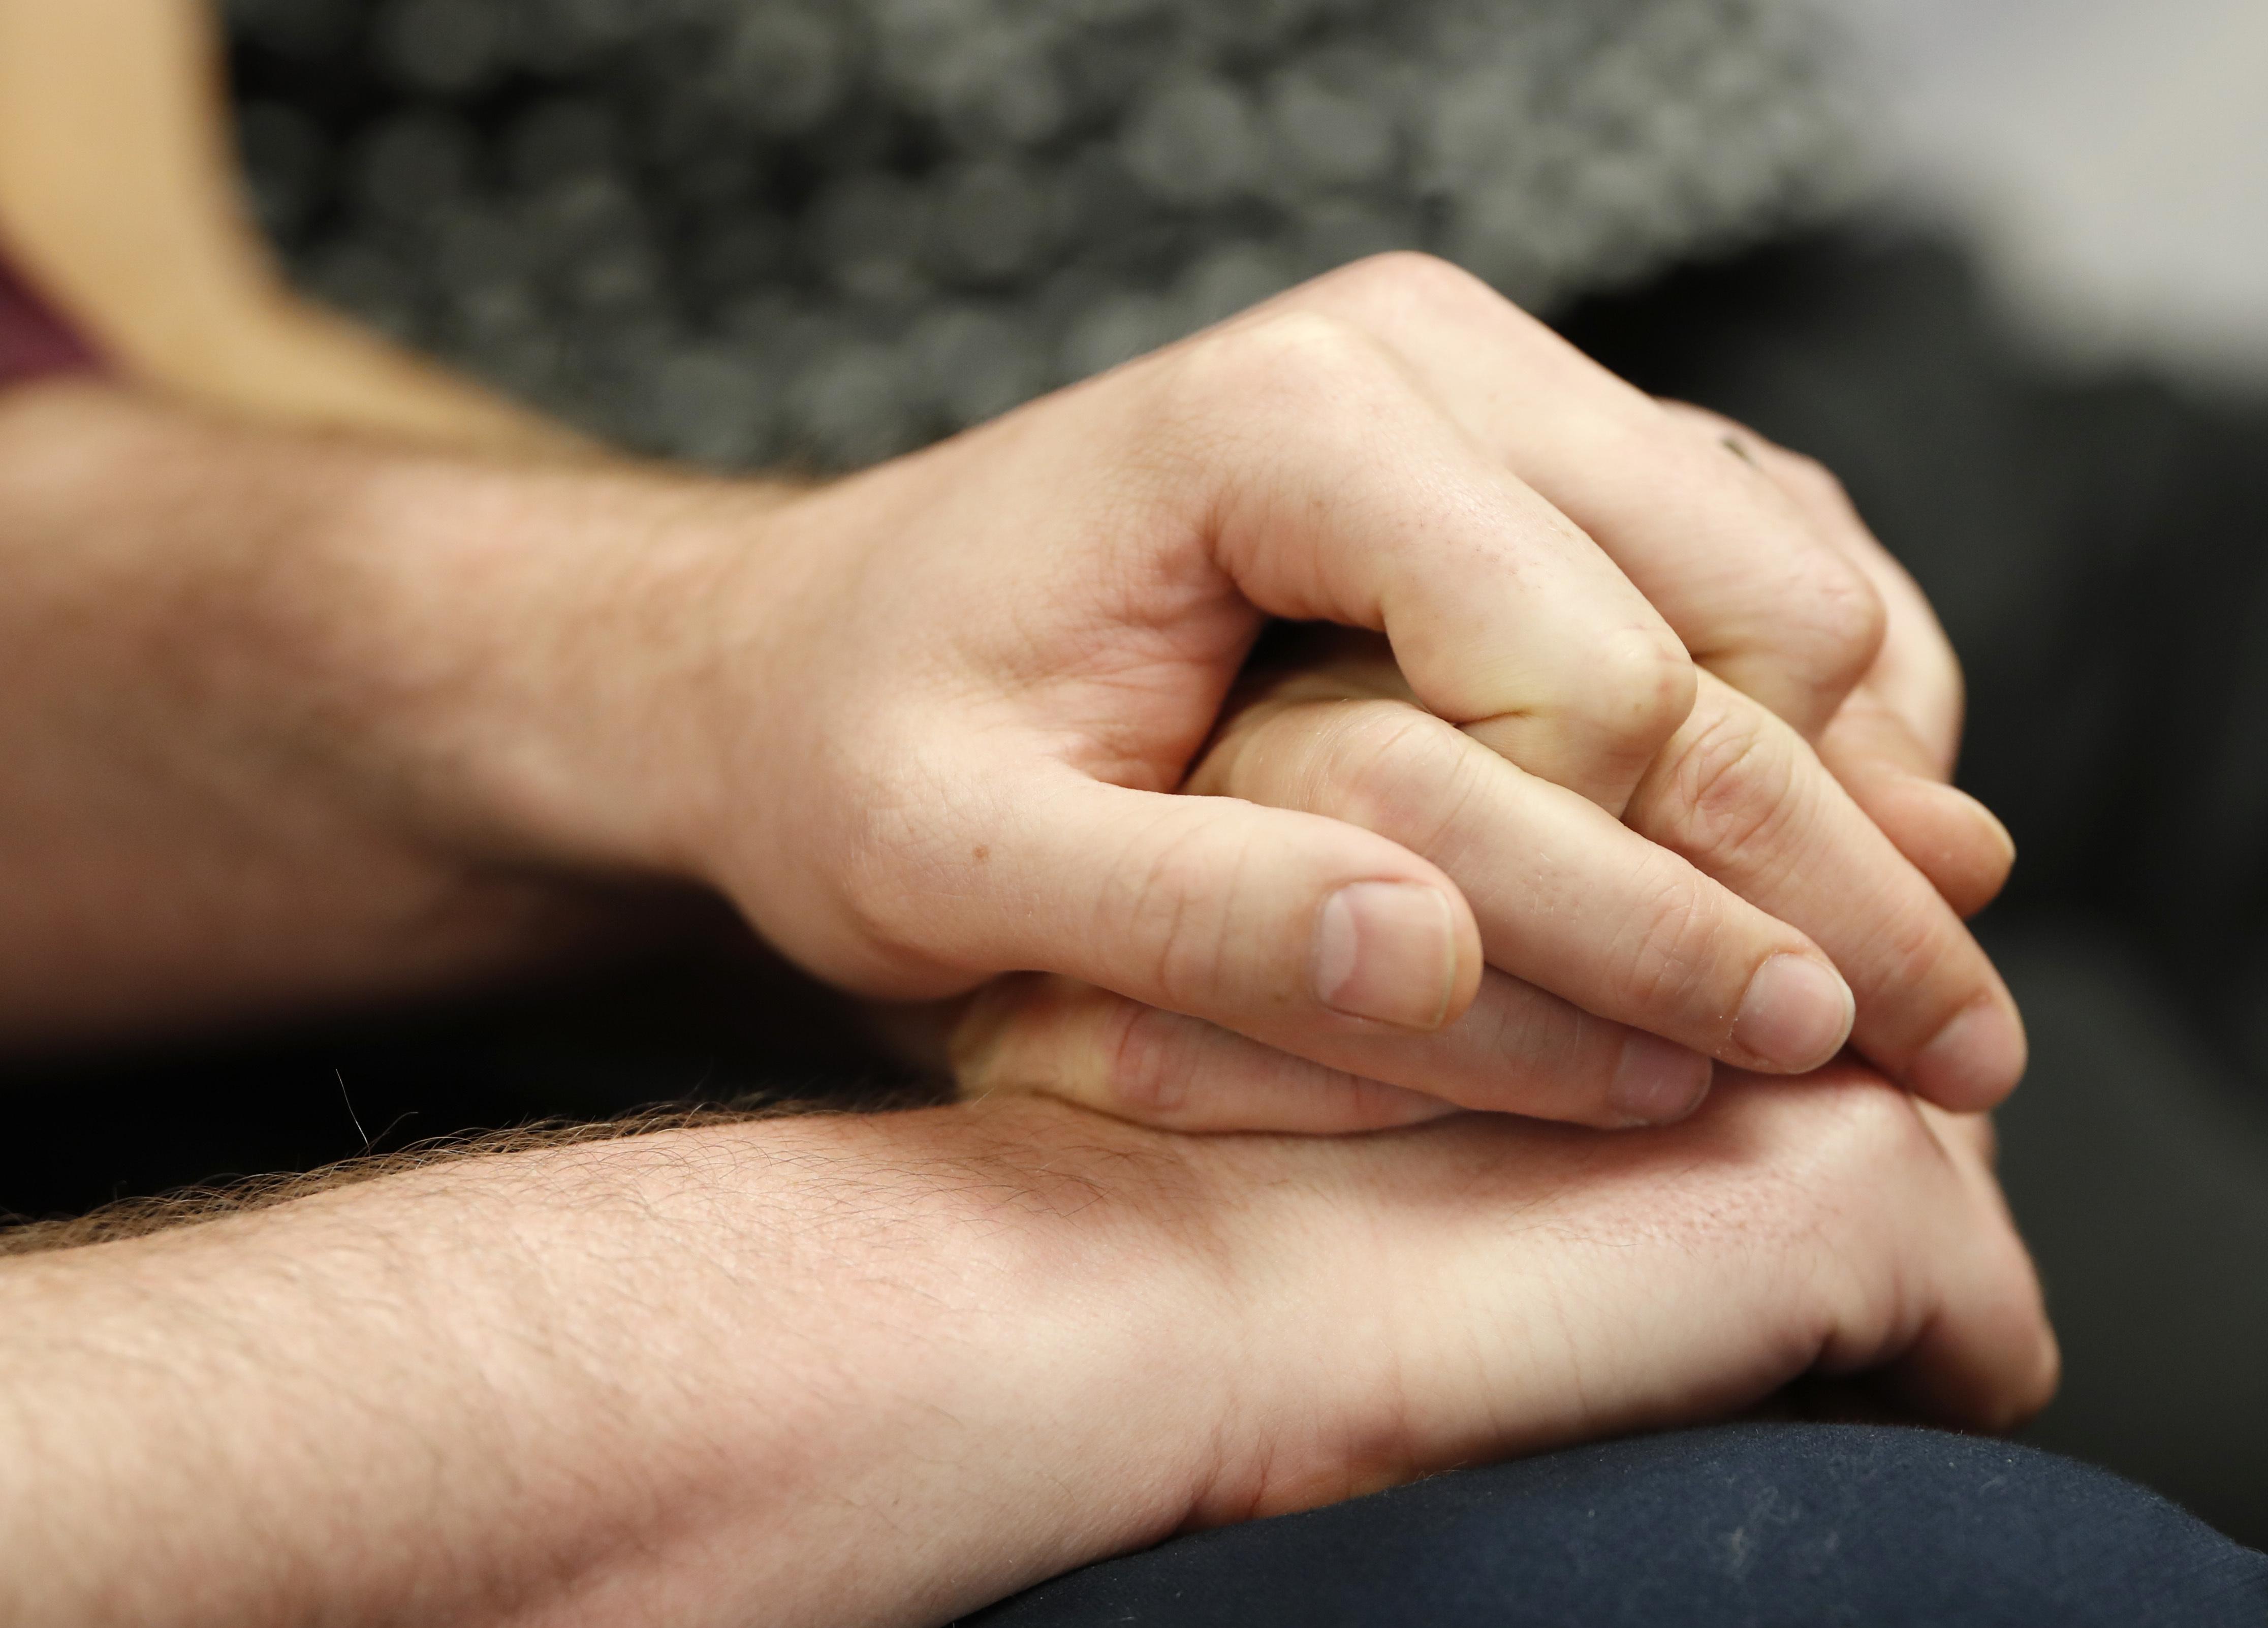 Photo: Masterpiece Charlie Craig David Mullins Hold Hands (6-4-18 AP)